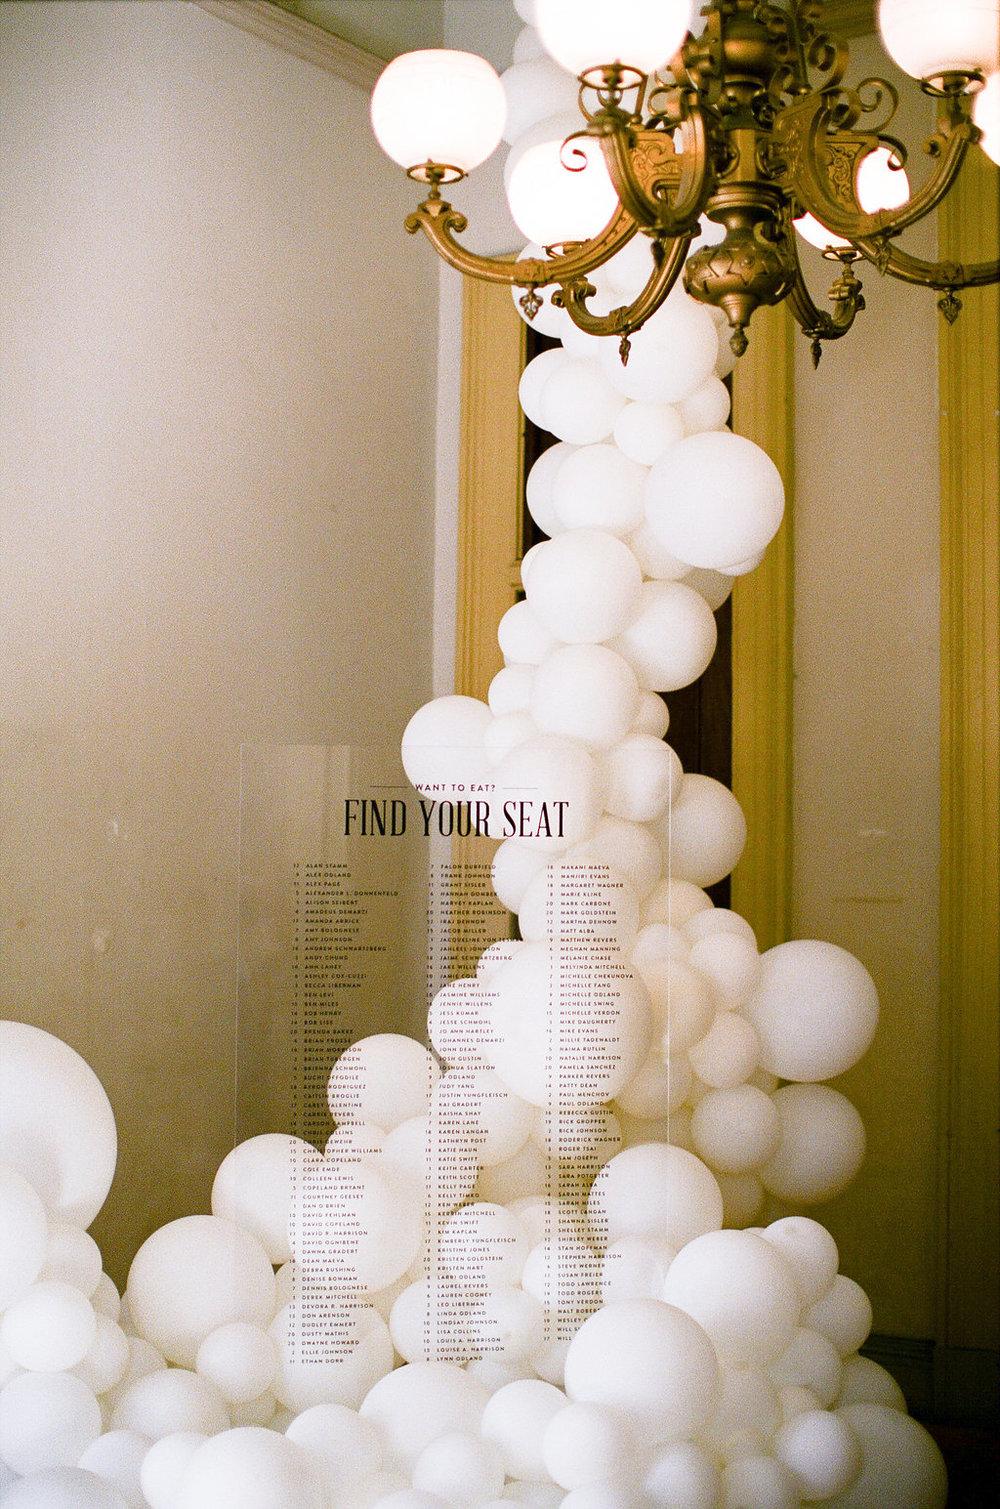 Wedding balloons Organic Balloon Art Napa Valley St. Helena - Zim Balloons.jpg